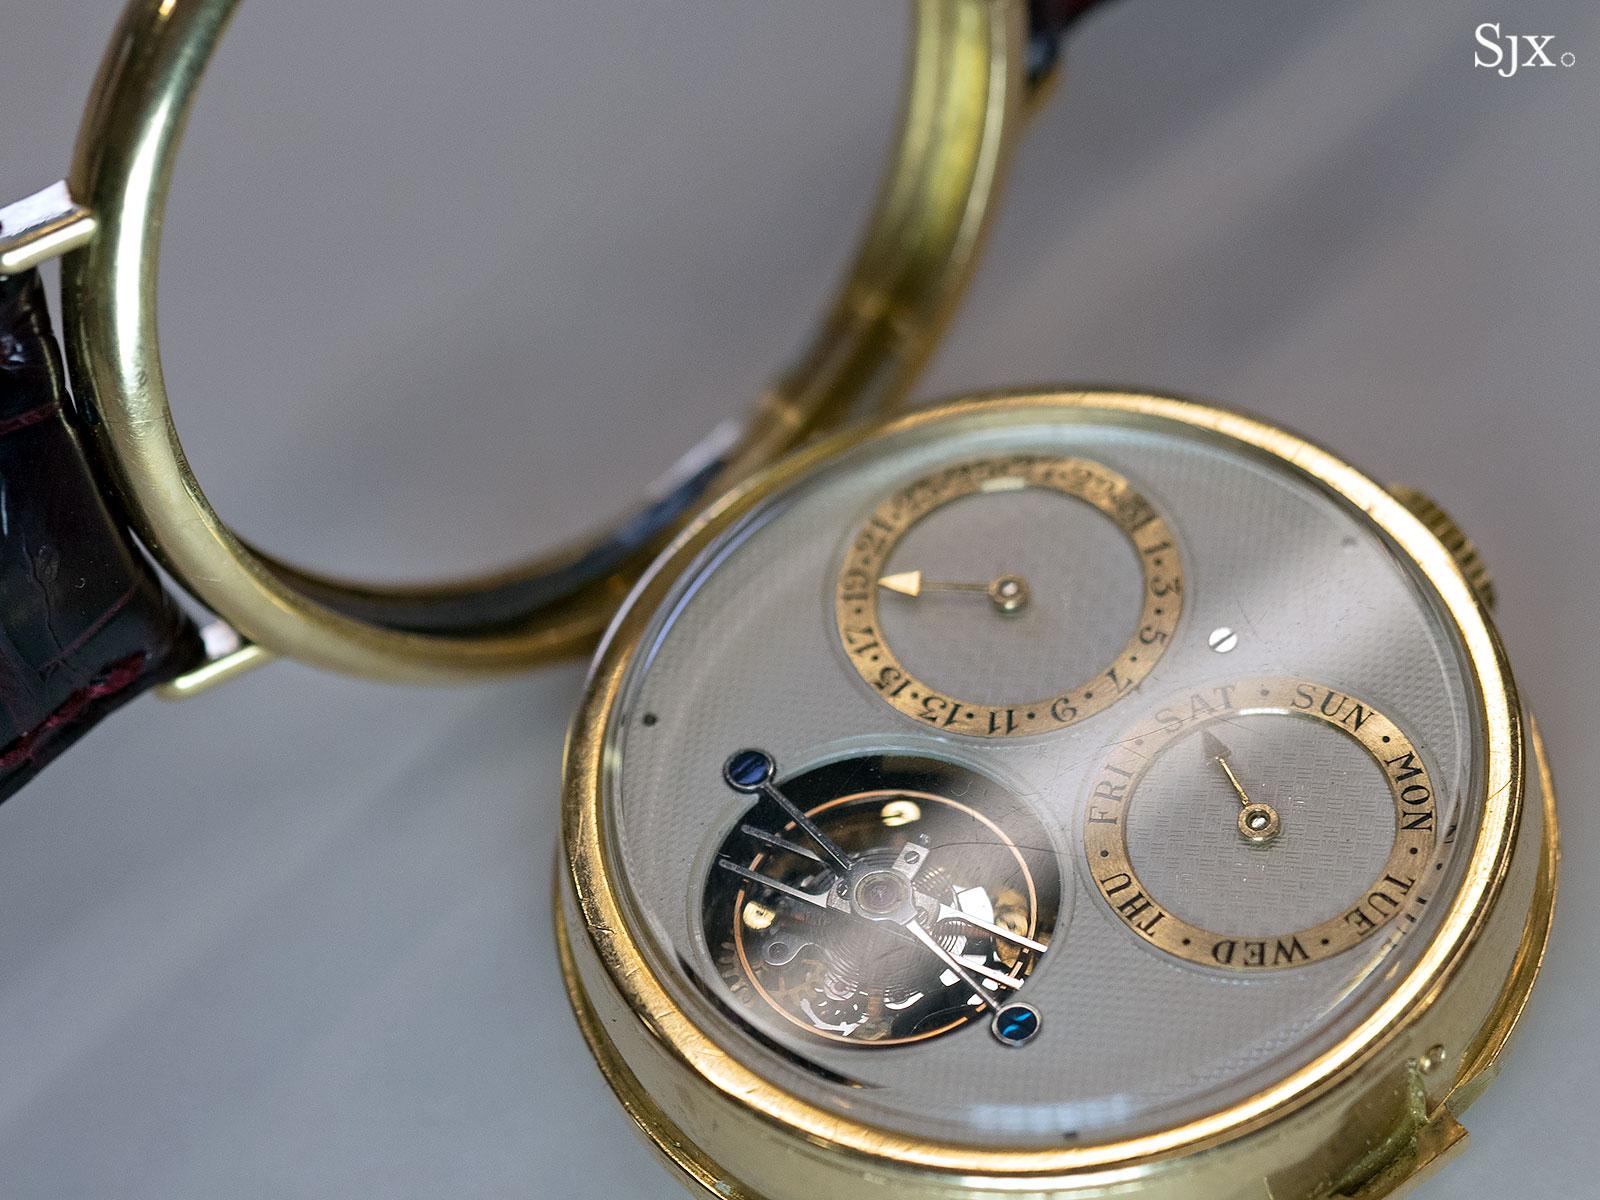 George Daniels Spring Case Tourbillon Wristwatch 14